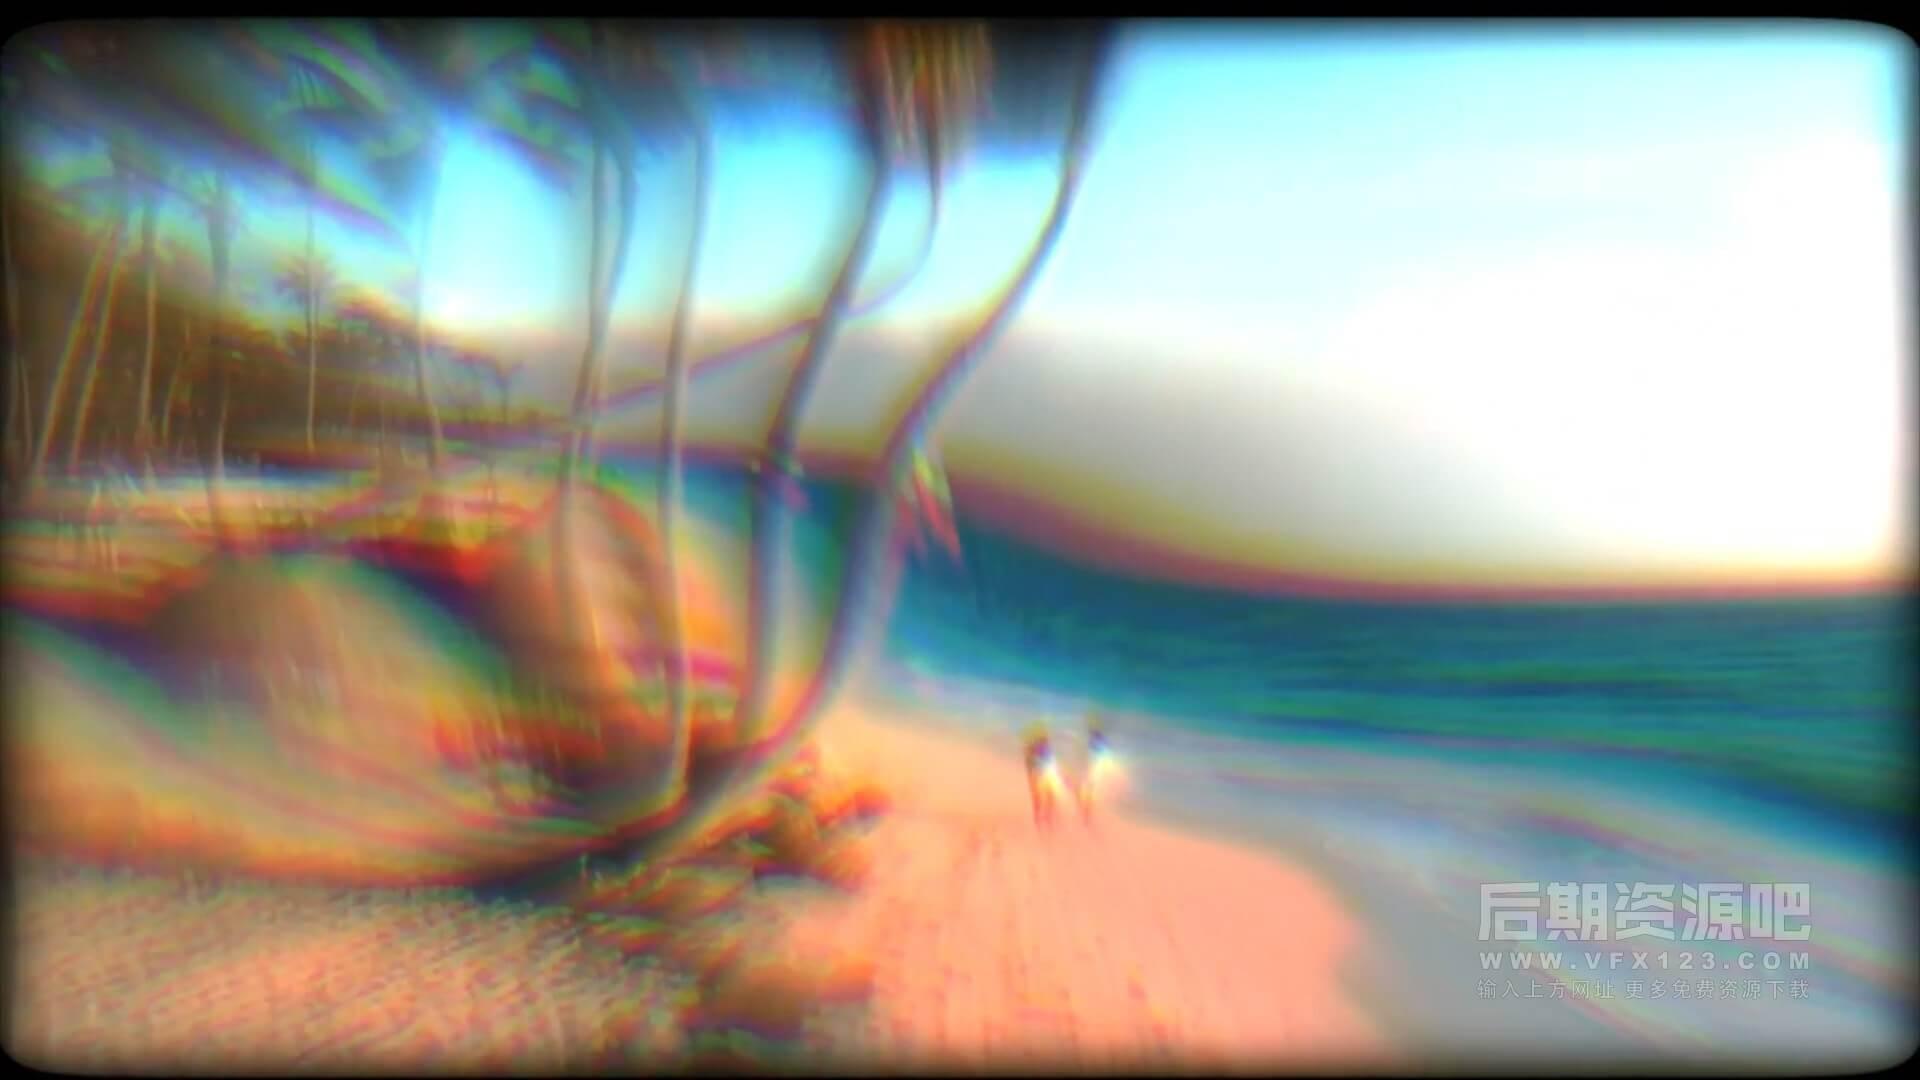 fcpx插件 8组梦境虚幻朦胧特效制作预设 Dream Effect